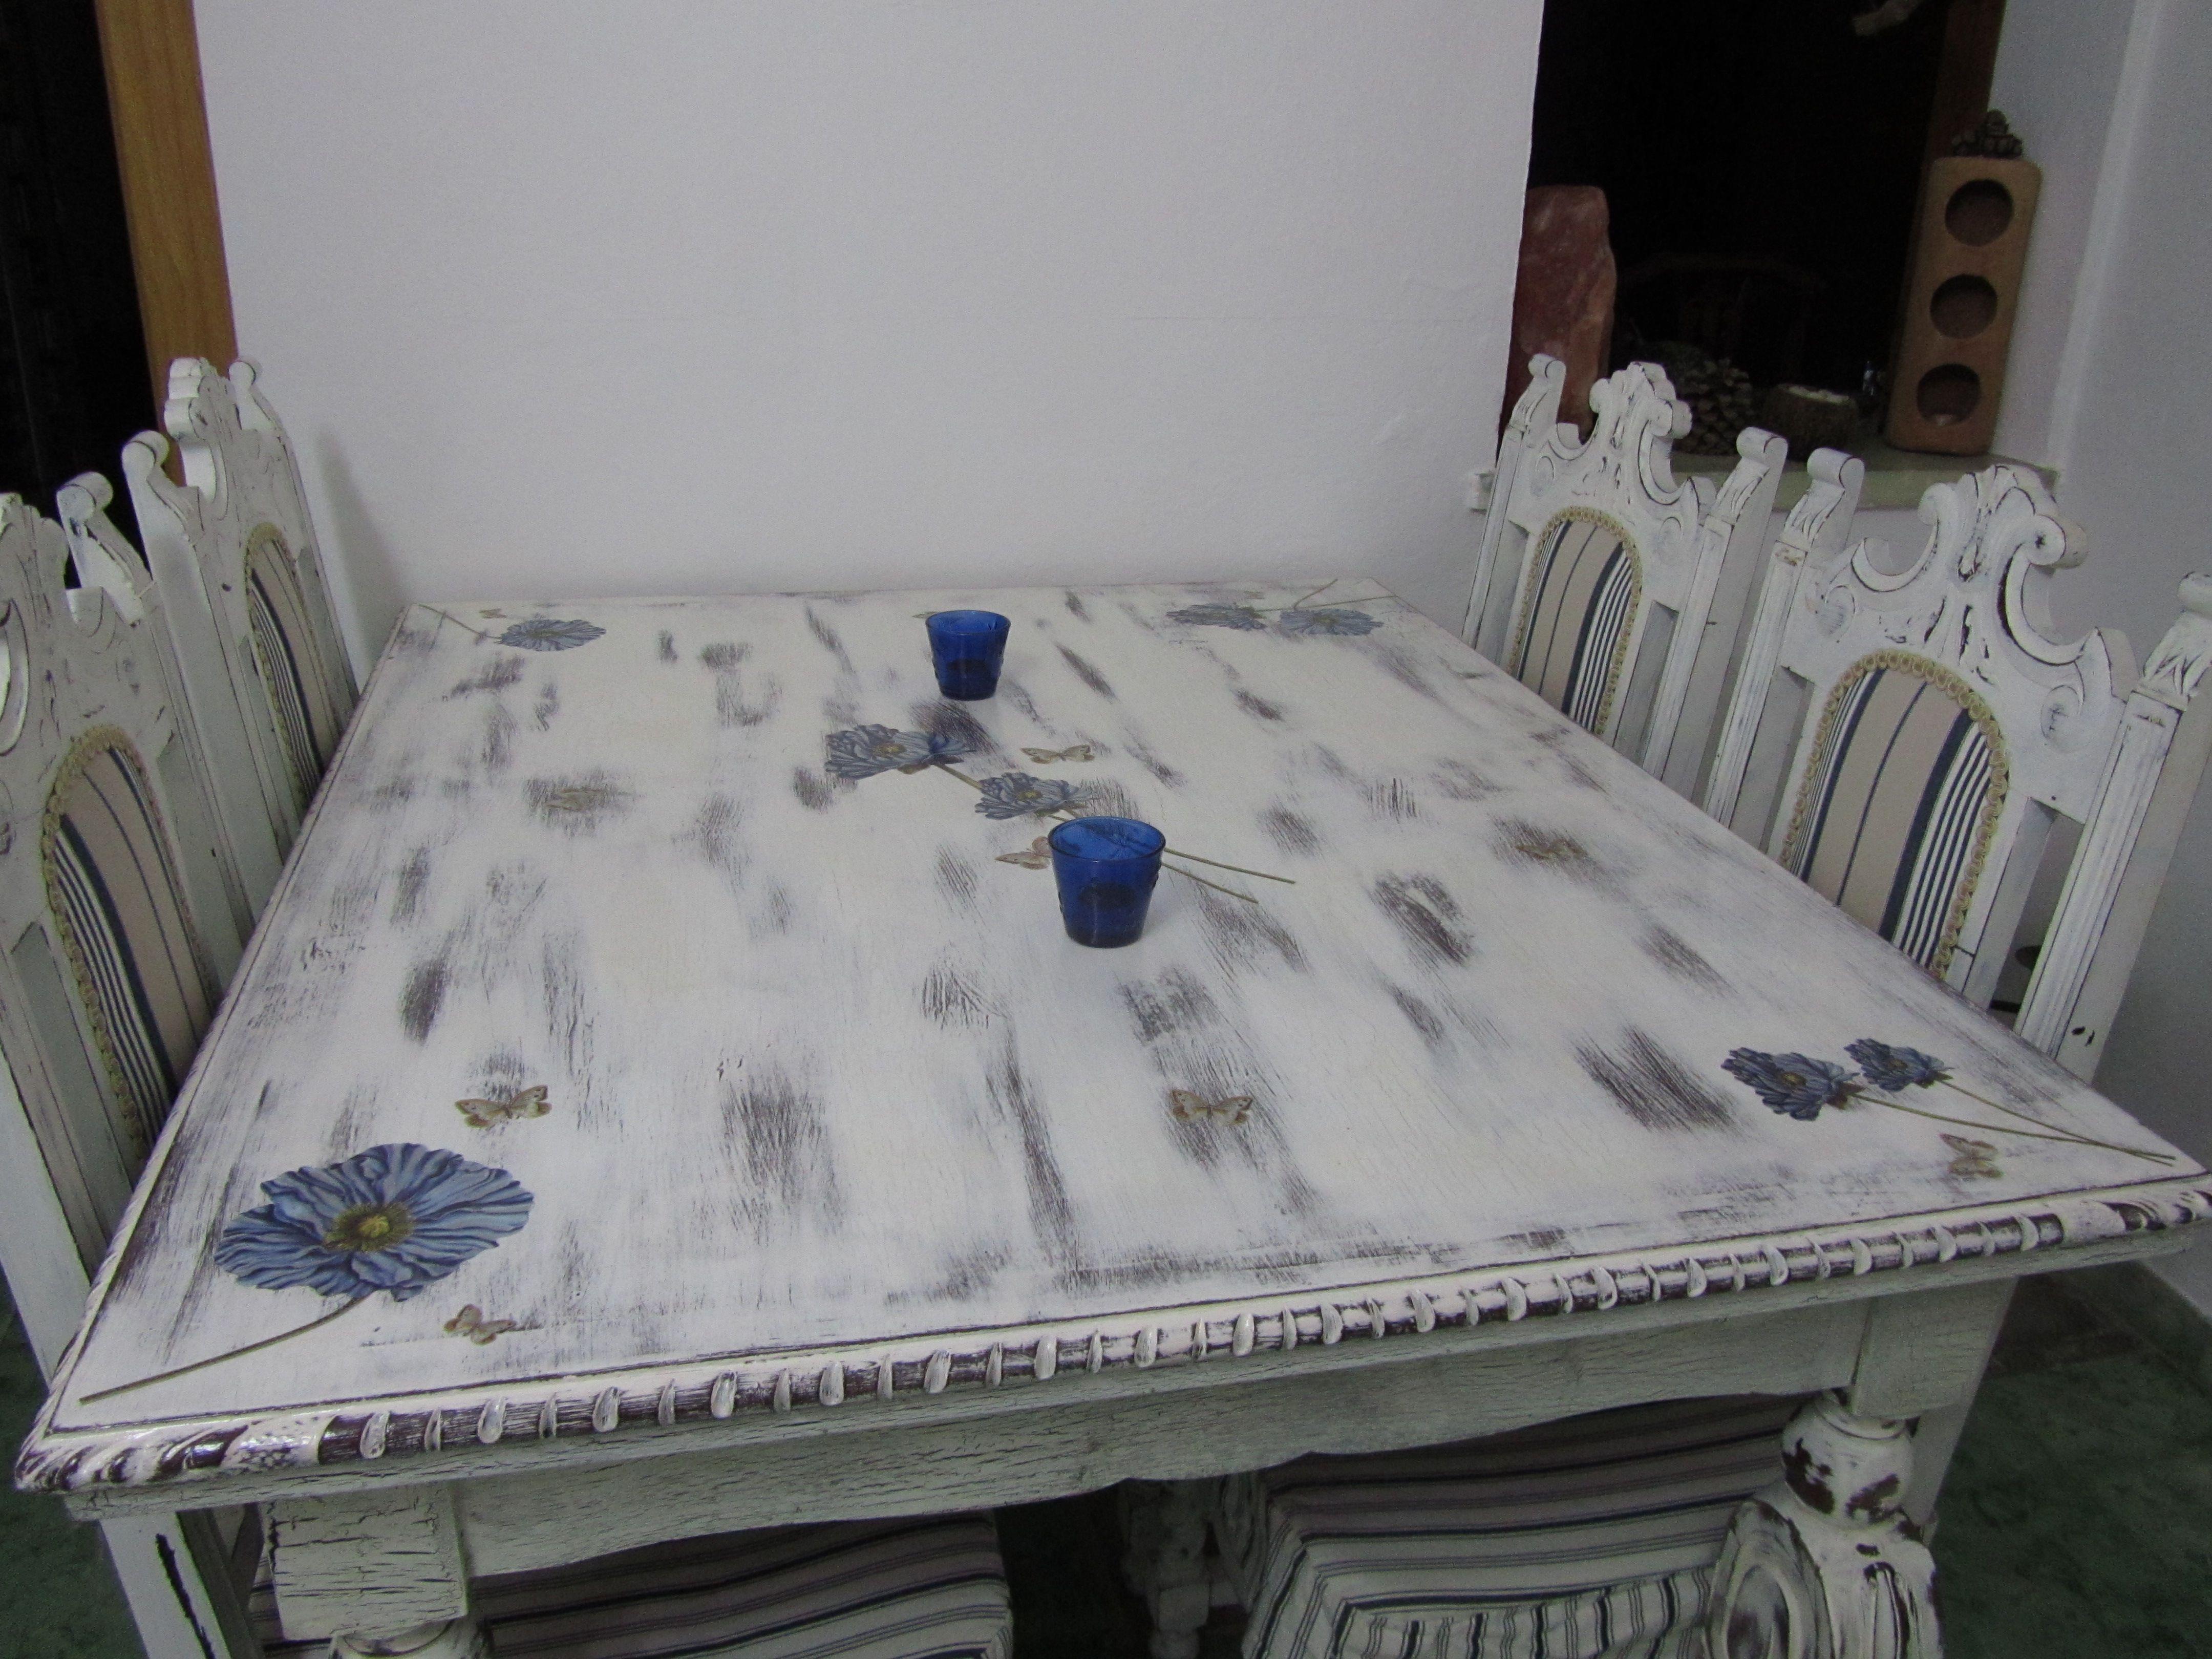 Mesa de edor restaurada y pintada a mano con apliques en